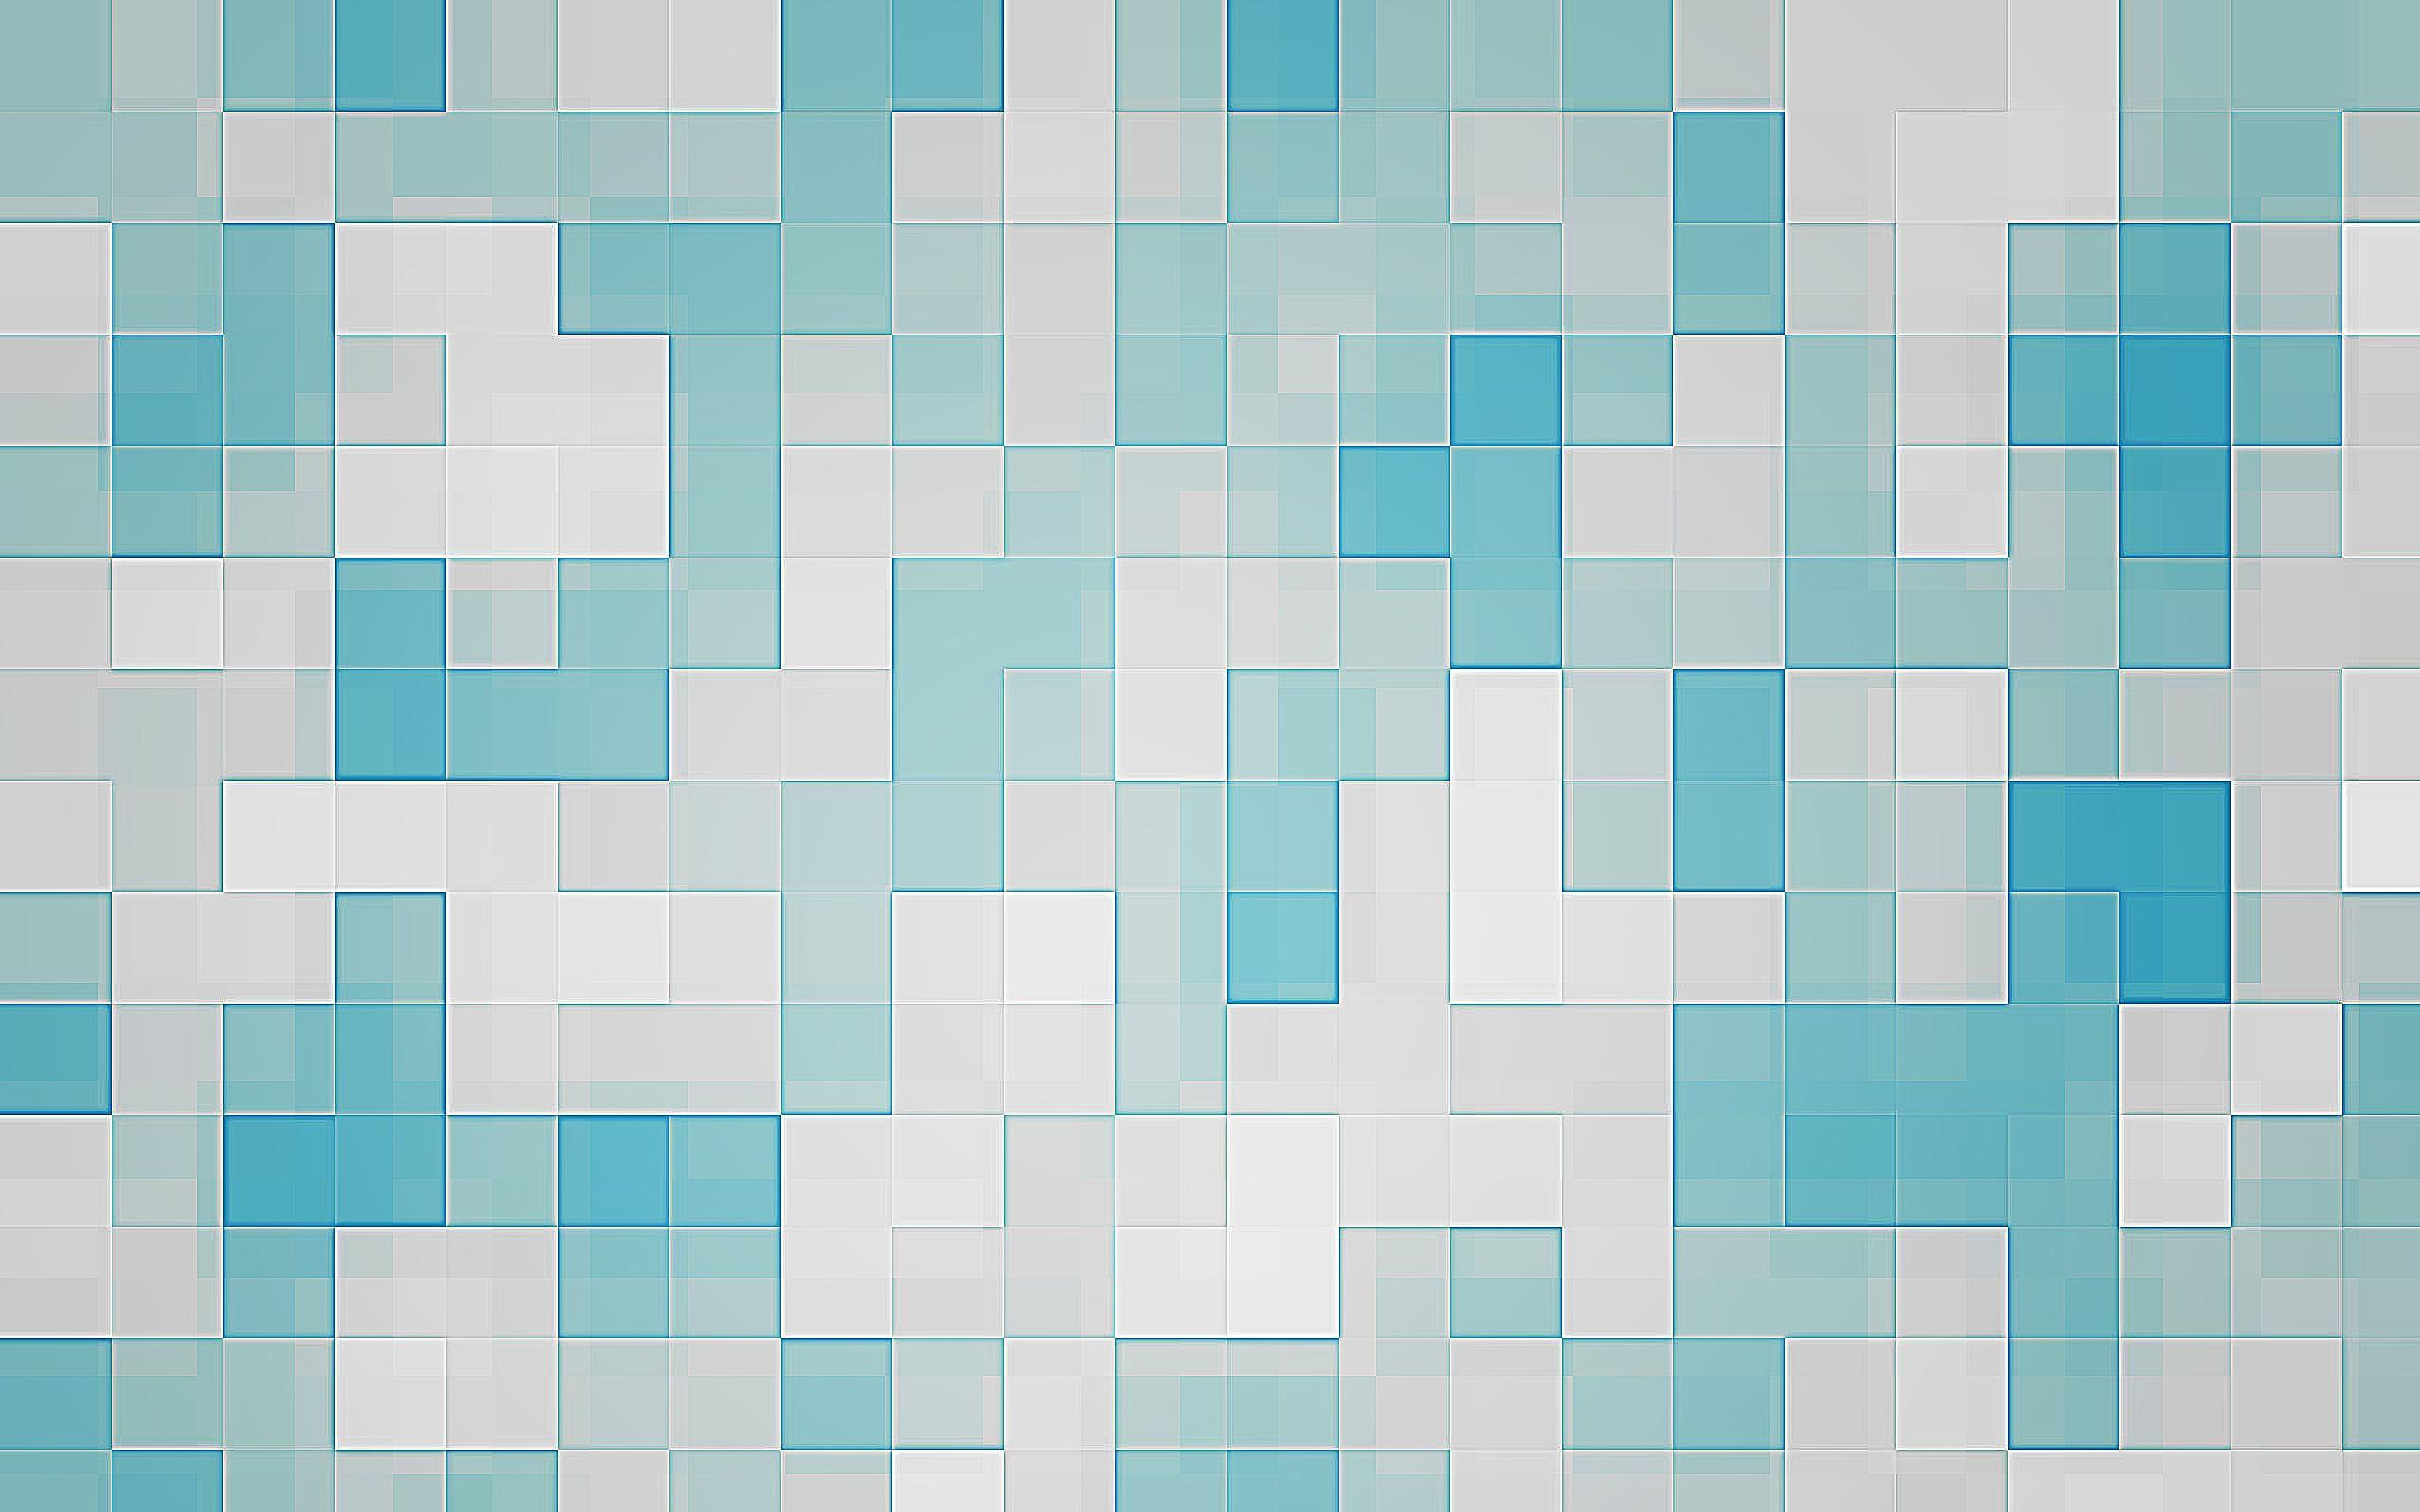 Wallpaper : digital art, simple background, wall, symmetry ...